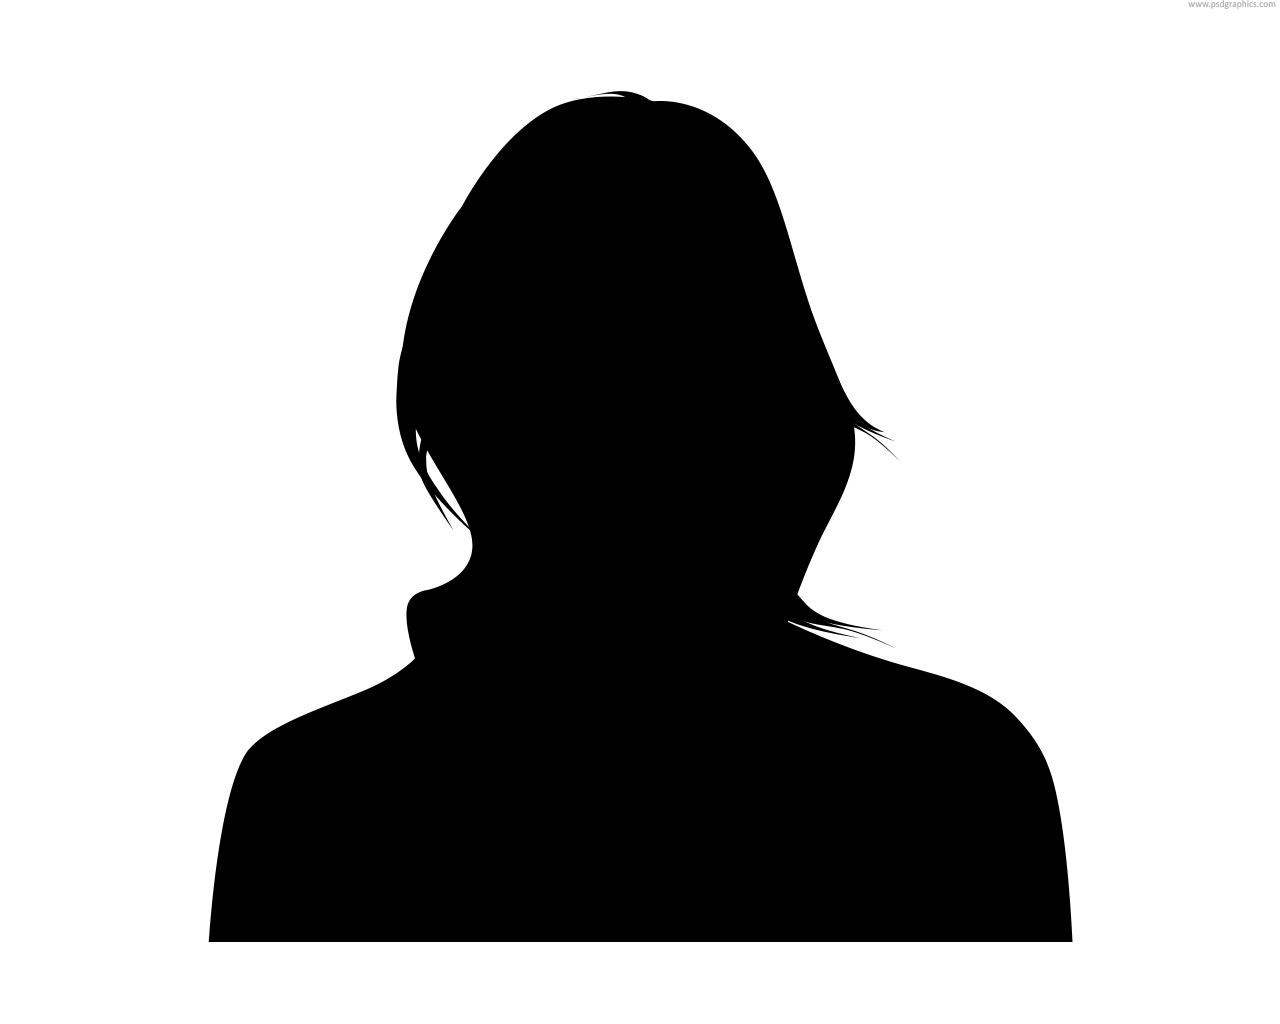 silhouette-007.jpg